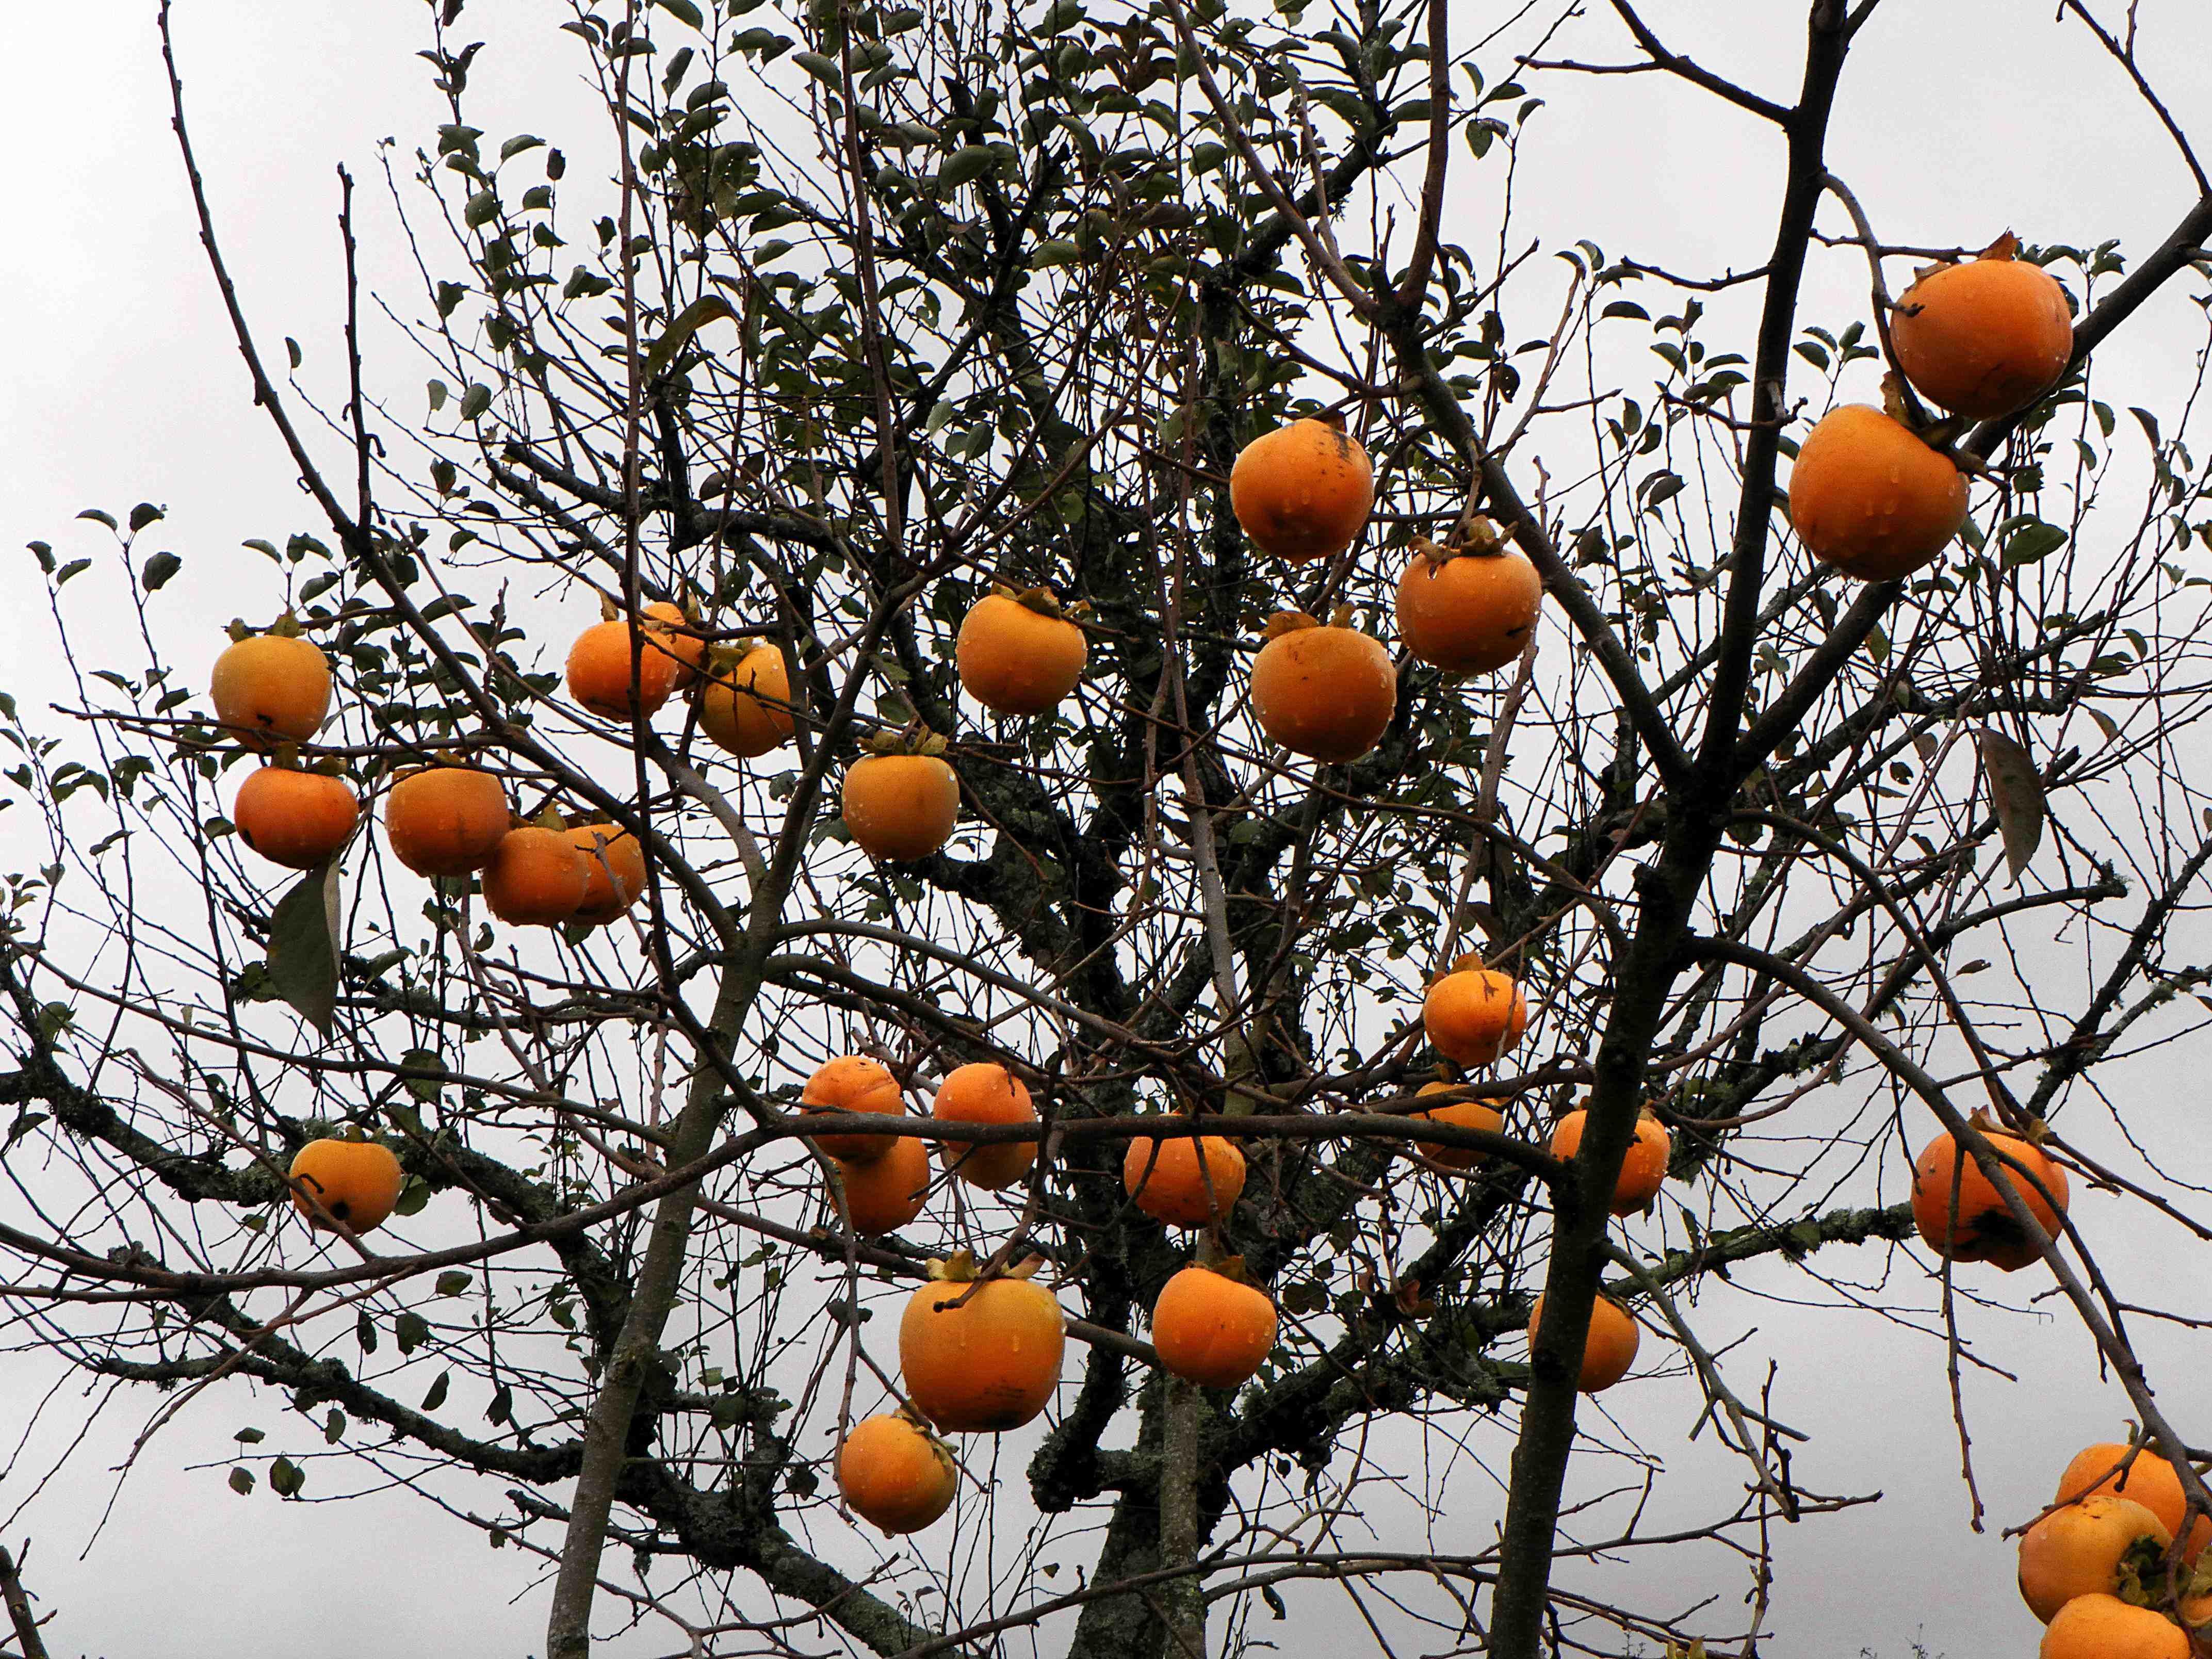 Фото хурма дерево сочи